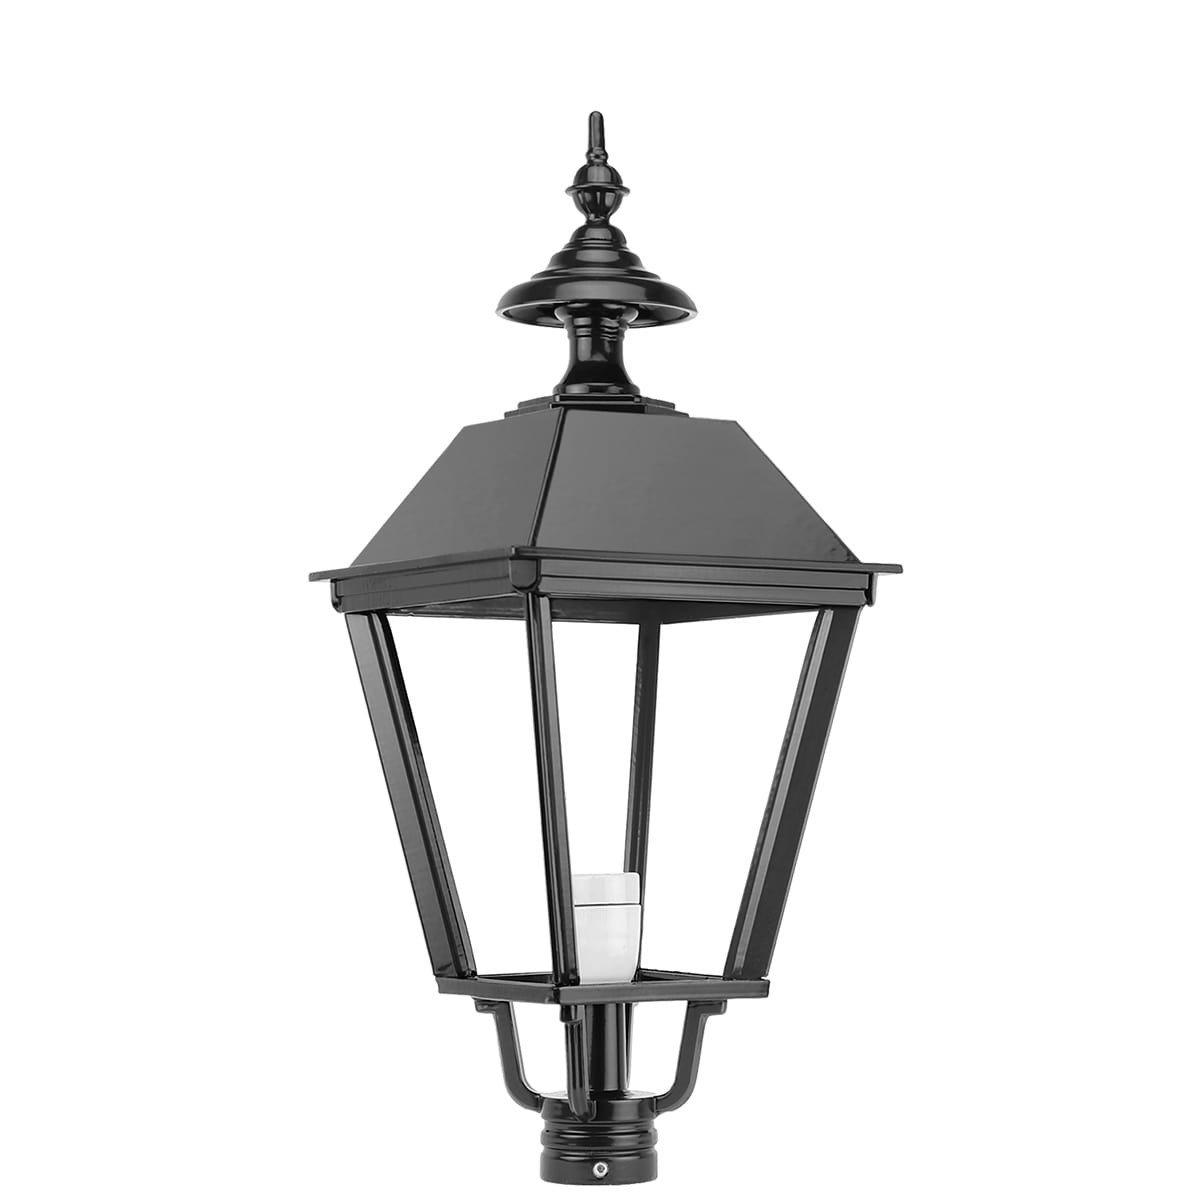 Outdoor lighting Classic Rural Loose lamp shade K03 - 60 cm